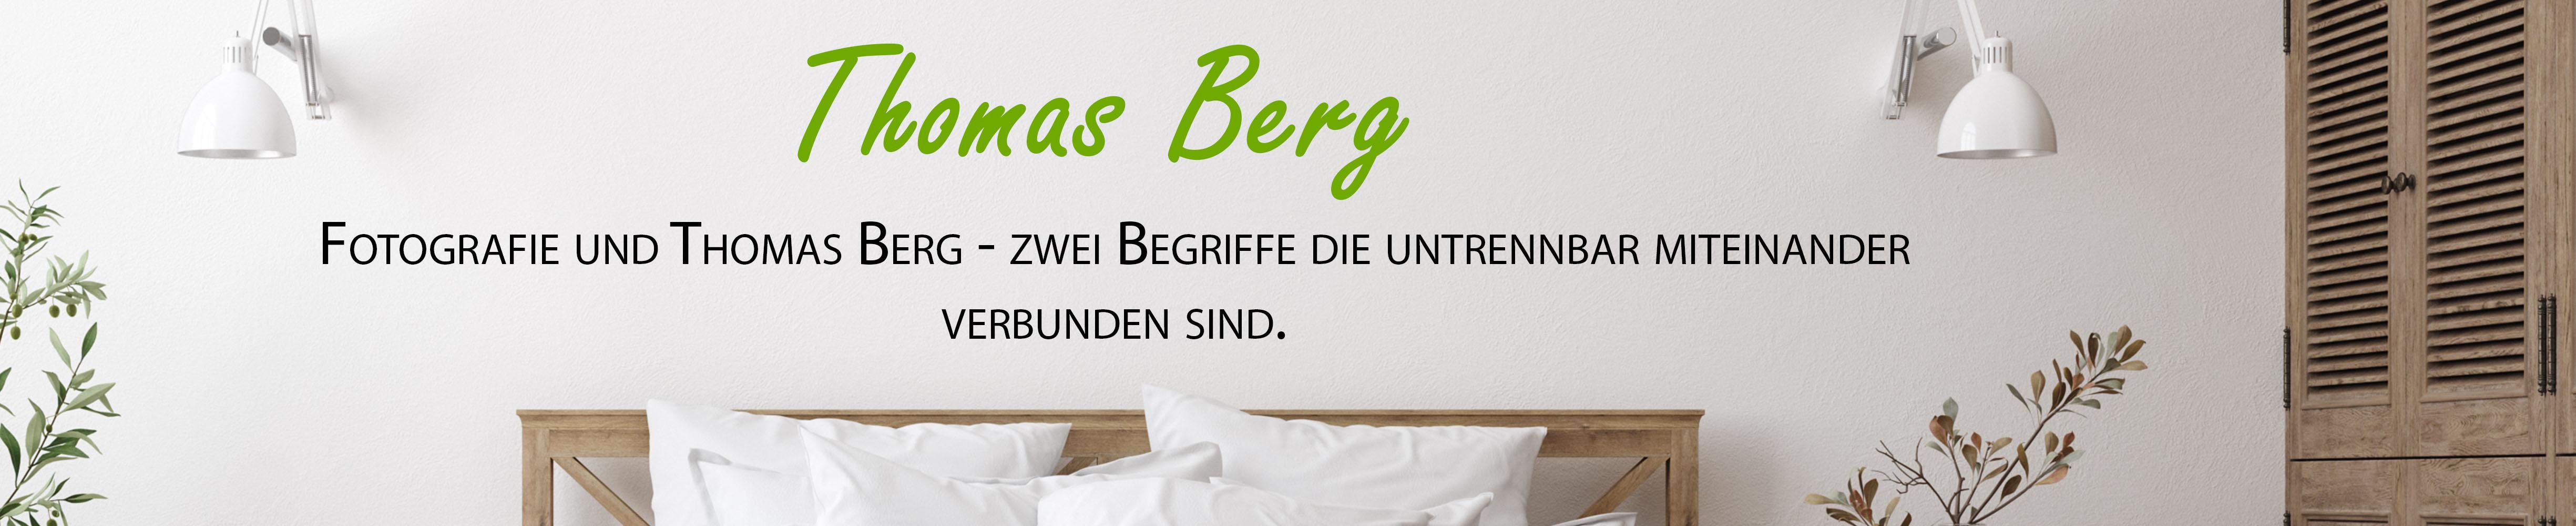 Kategorie: Thomas Berg